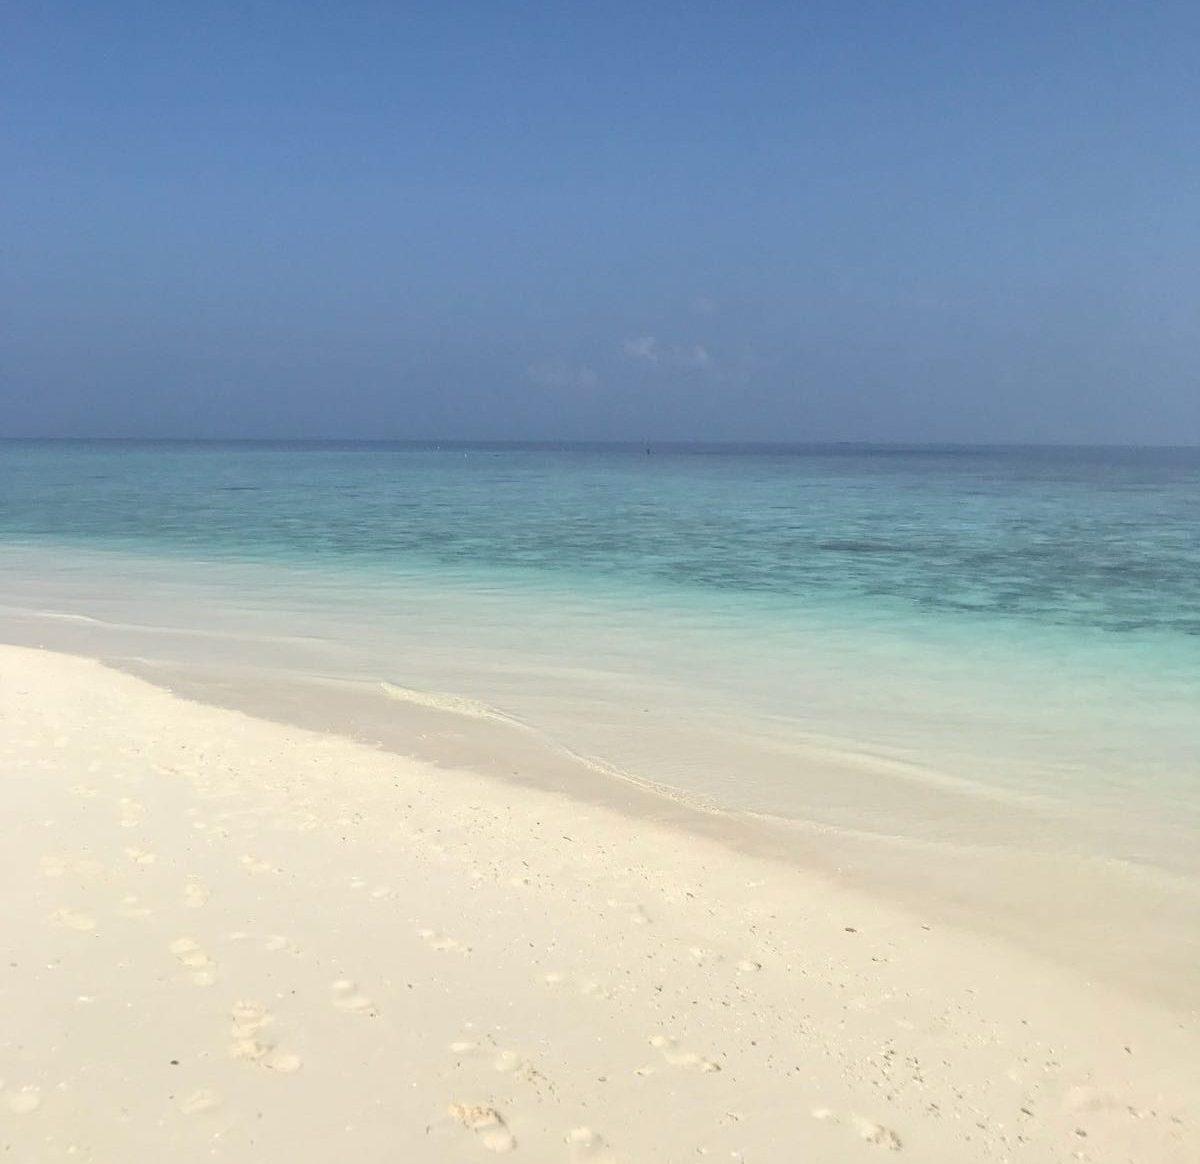 La playa Azul à Cuba